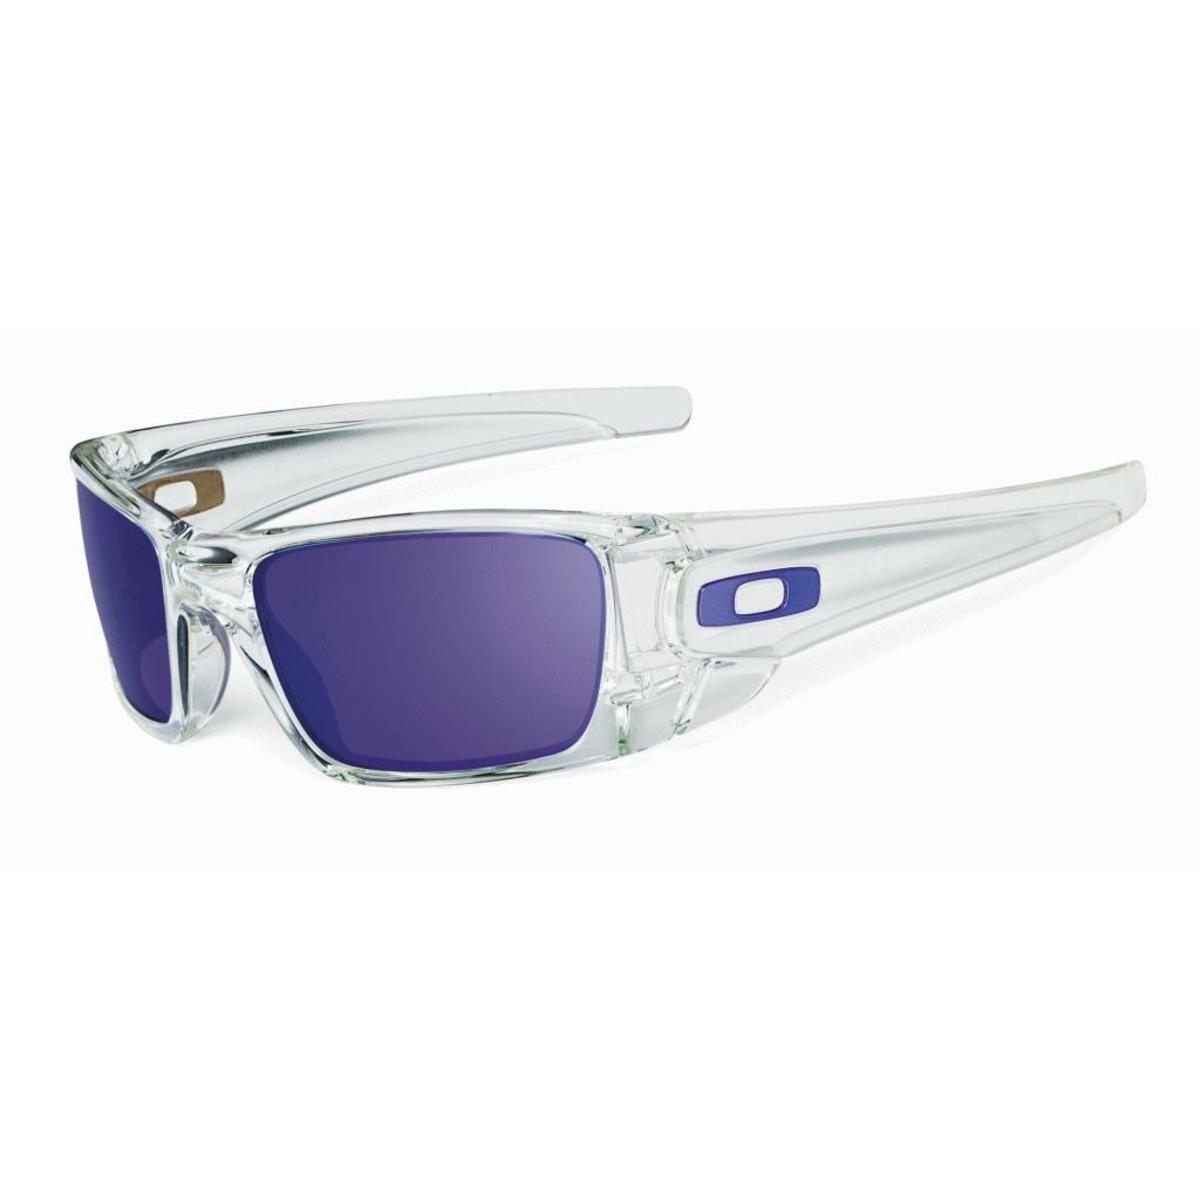 Pin by Foremost Golf on Oakley Sunglasses   Pinterest   Oakley ...